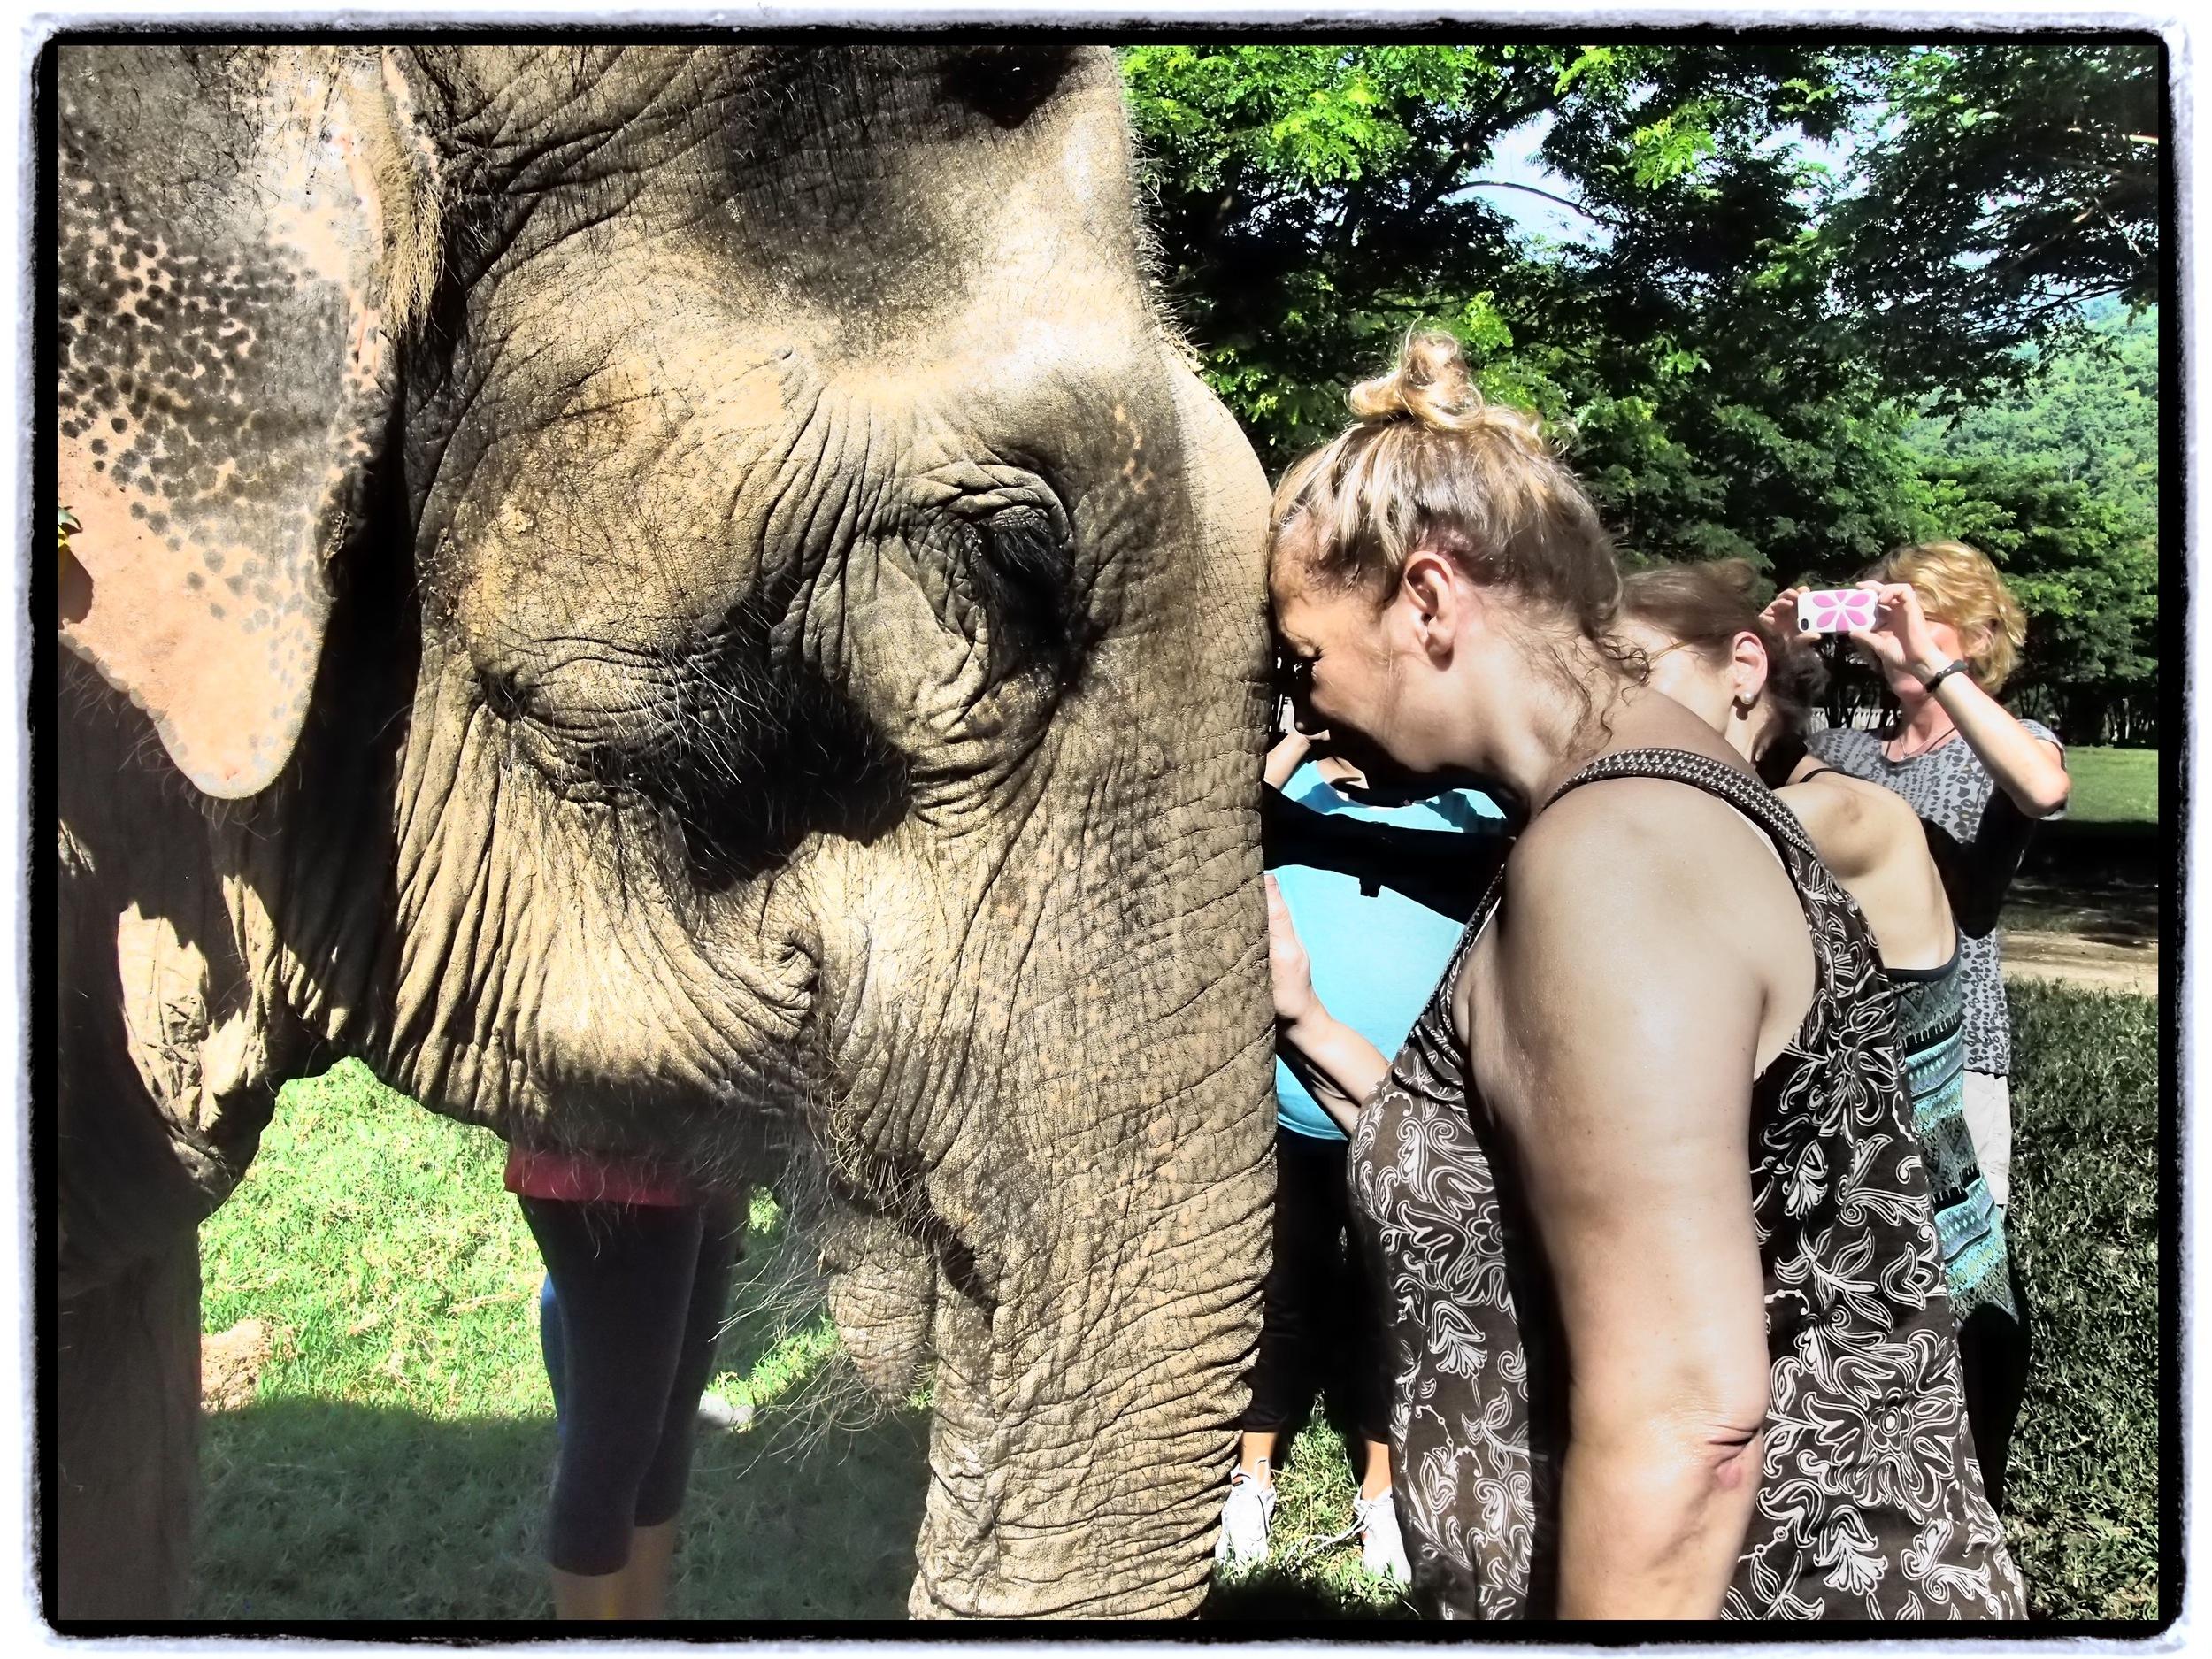 PHOTO ©PRAVASSA - in Thailand with the elephants